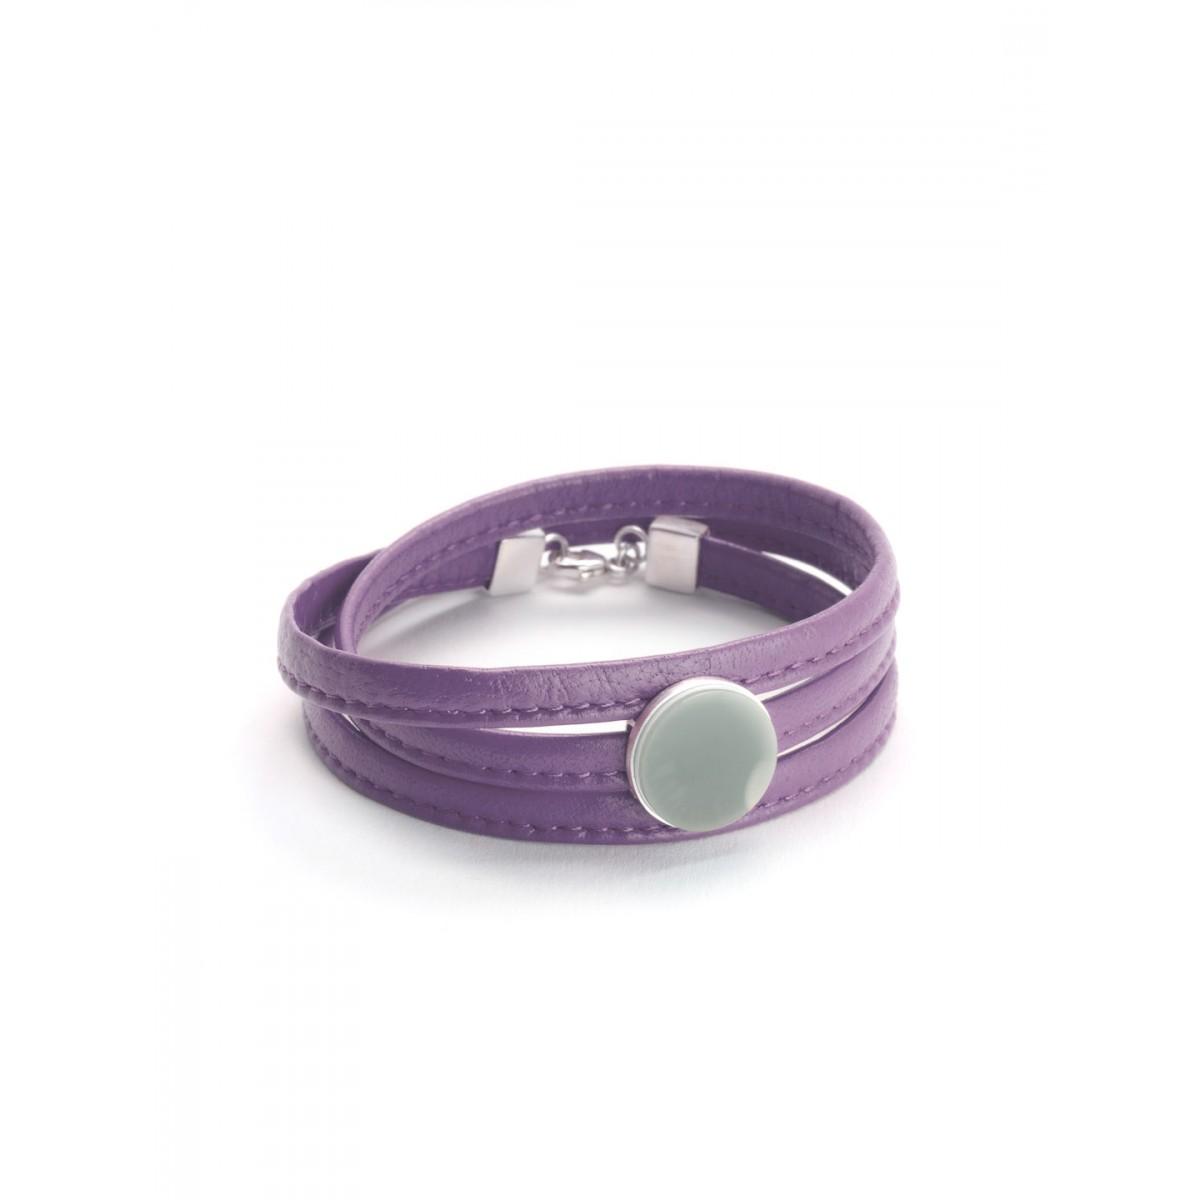 "Eva Slotta Jewellery ""Tint Deep"" Armband mit violettem Nappaleder  und Naturachat, 925 Silber"